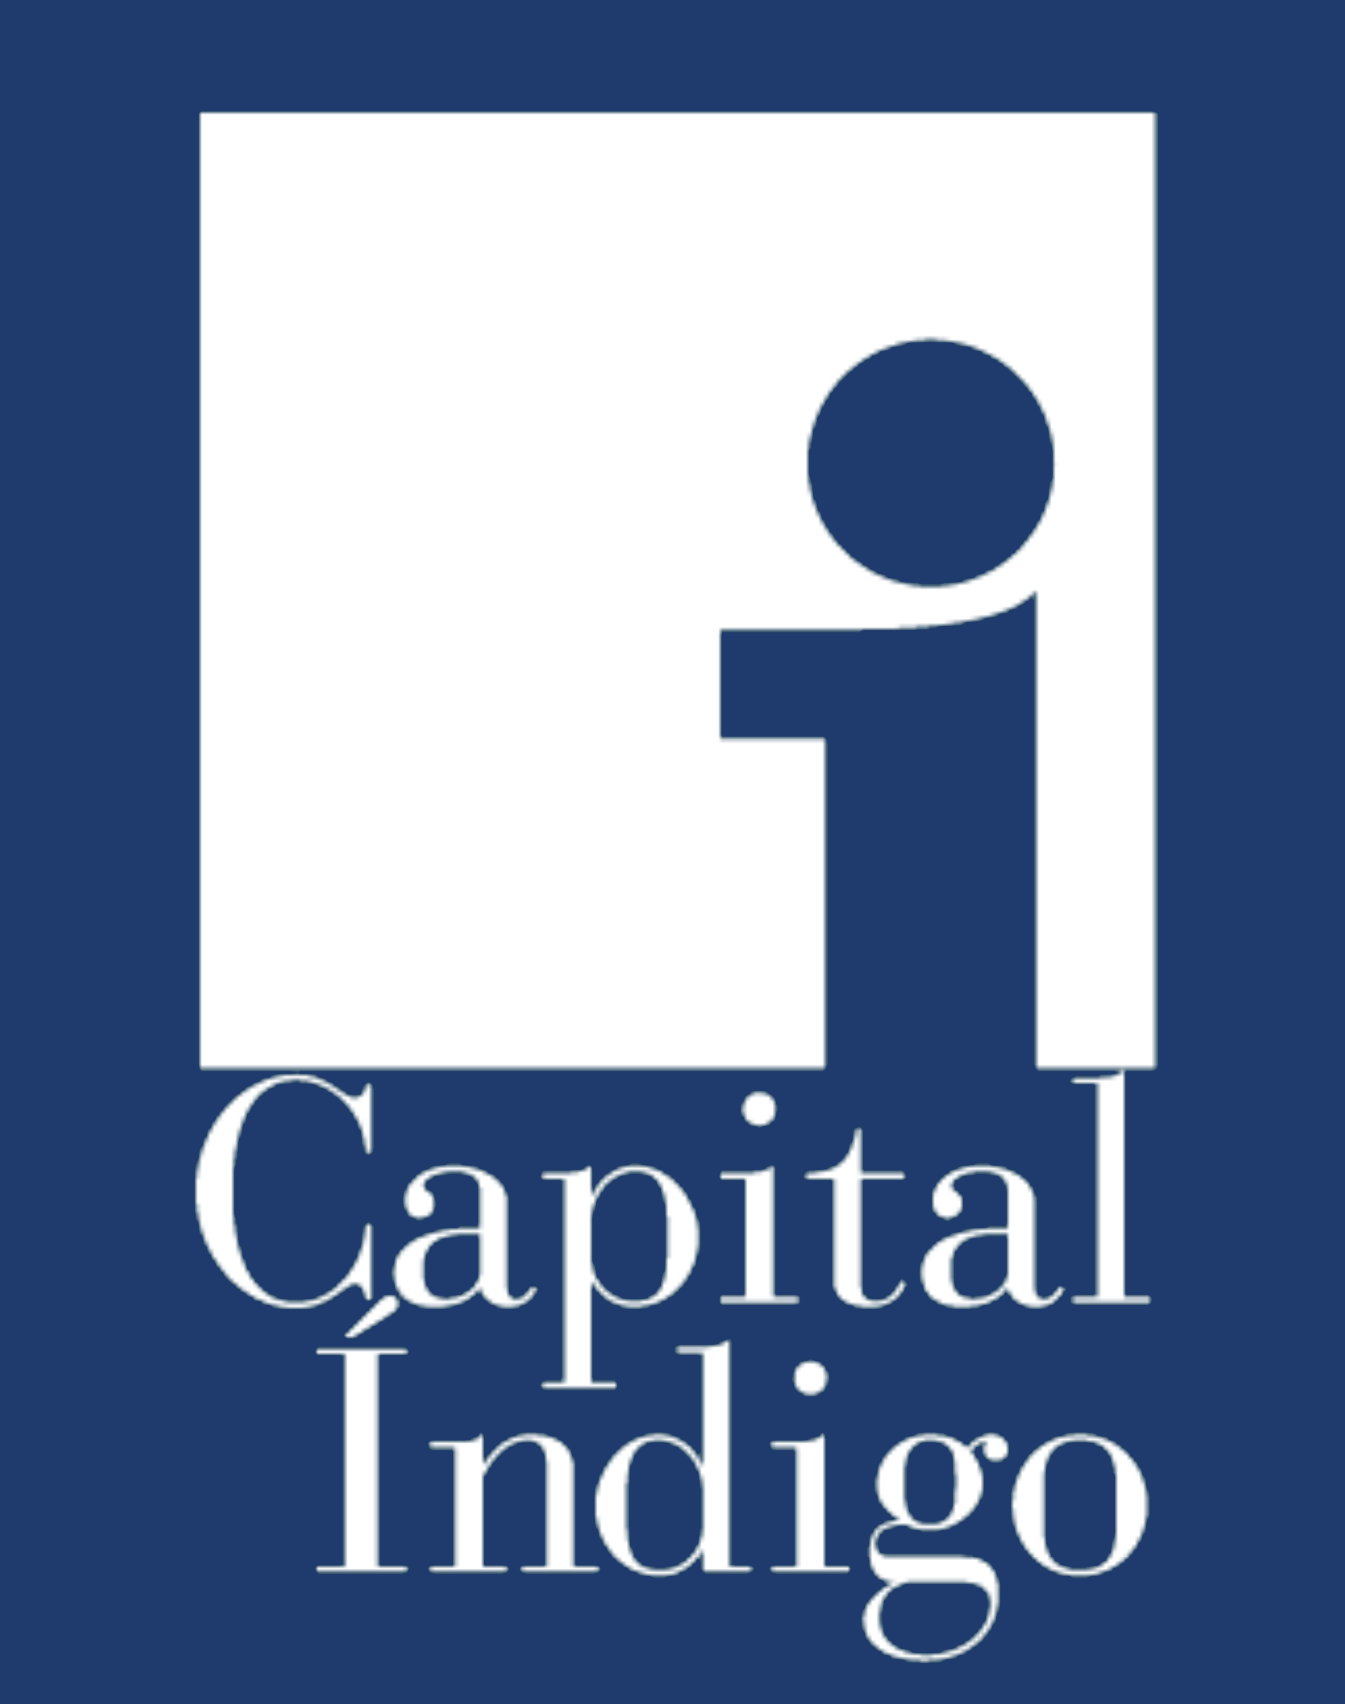 Capital Indigo